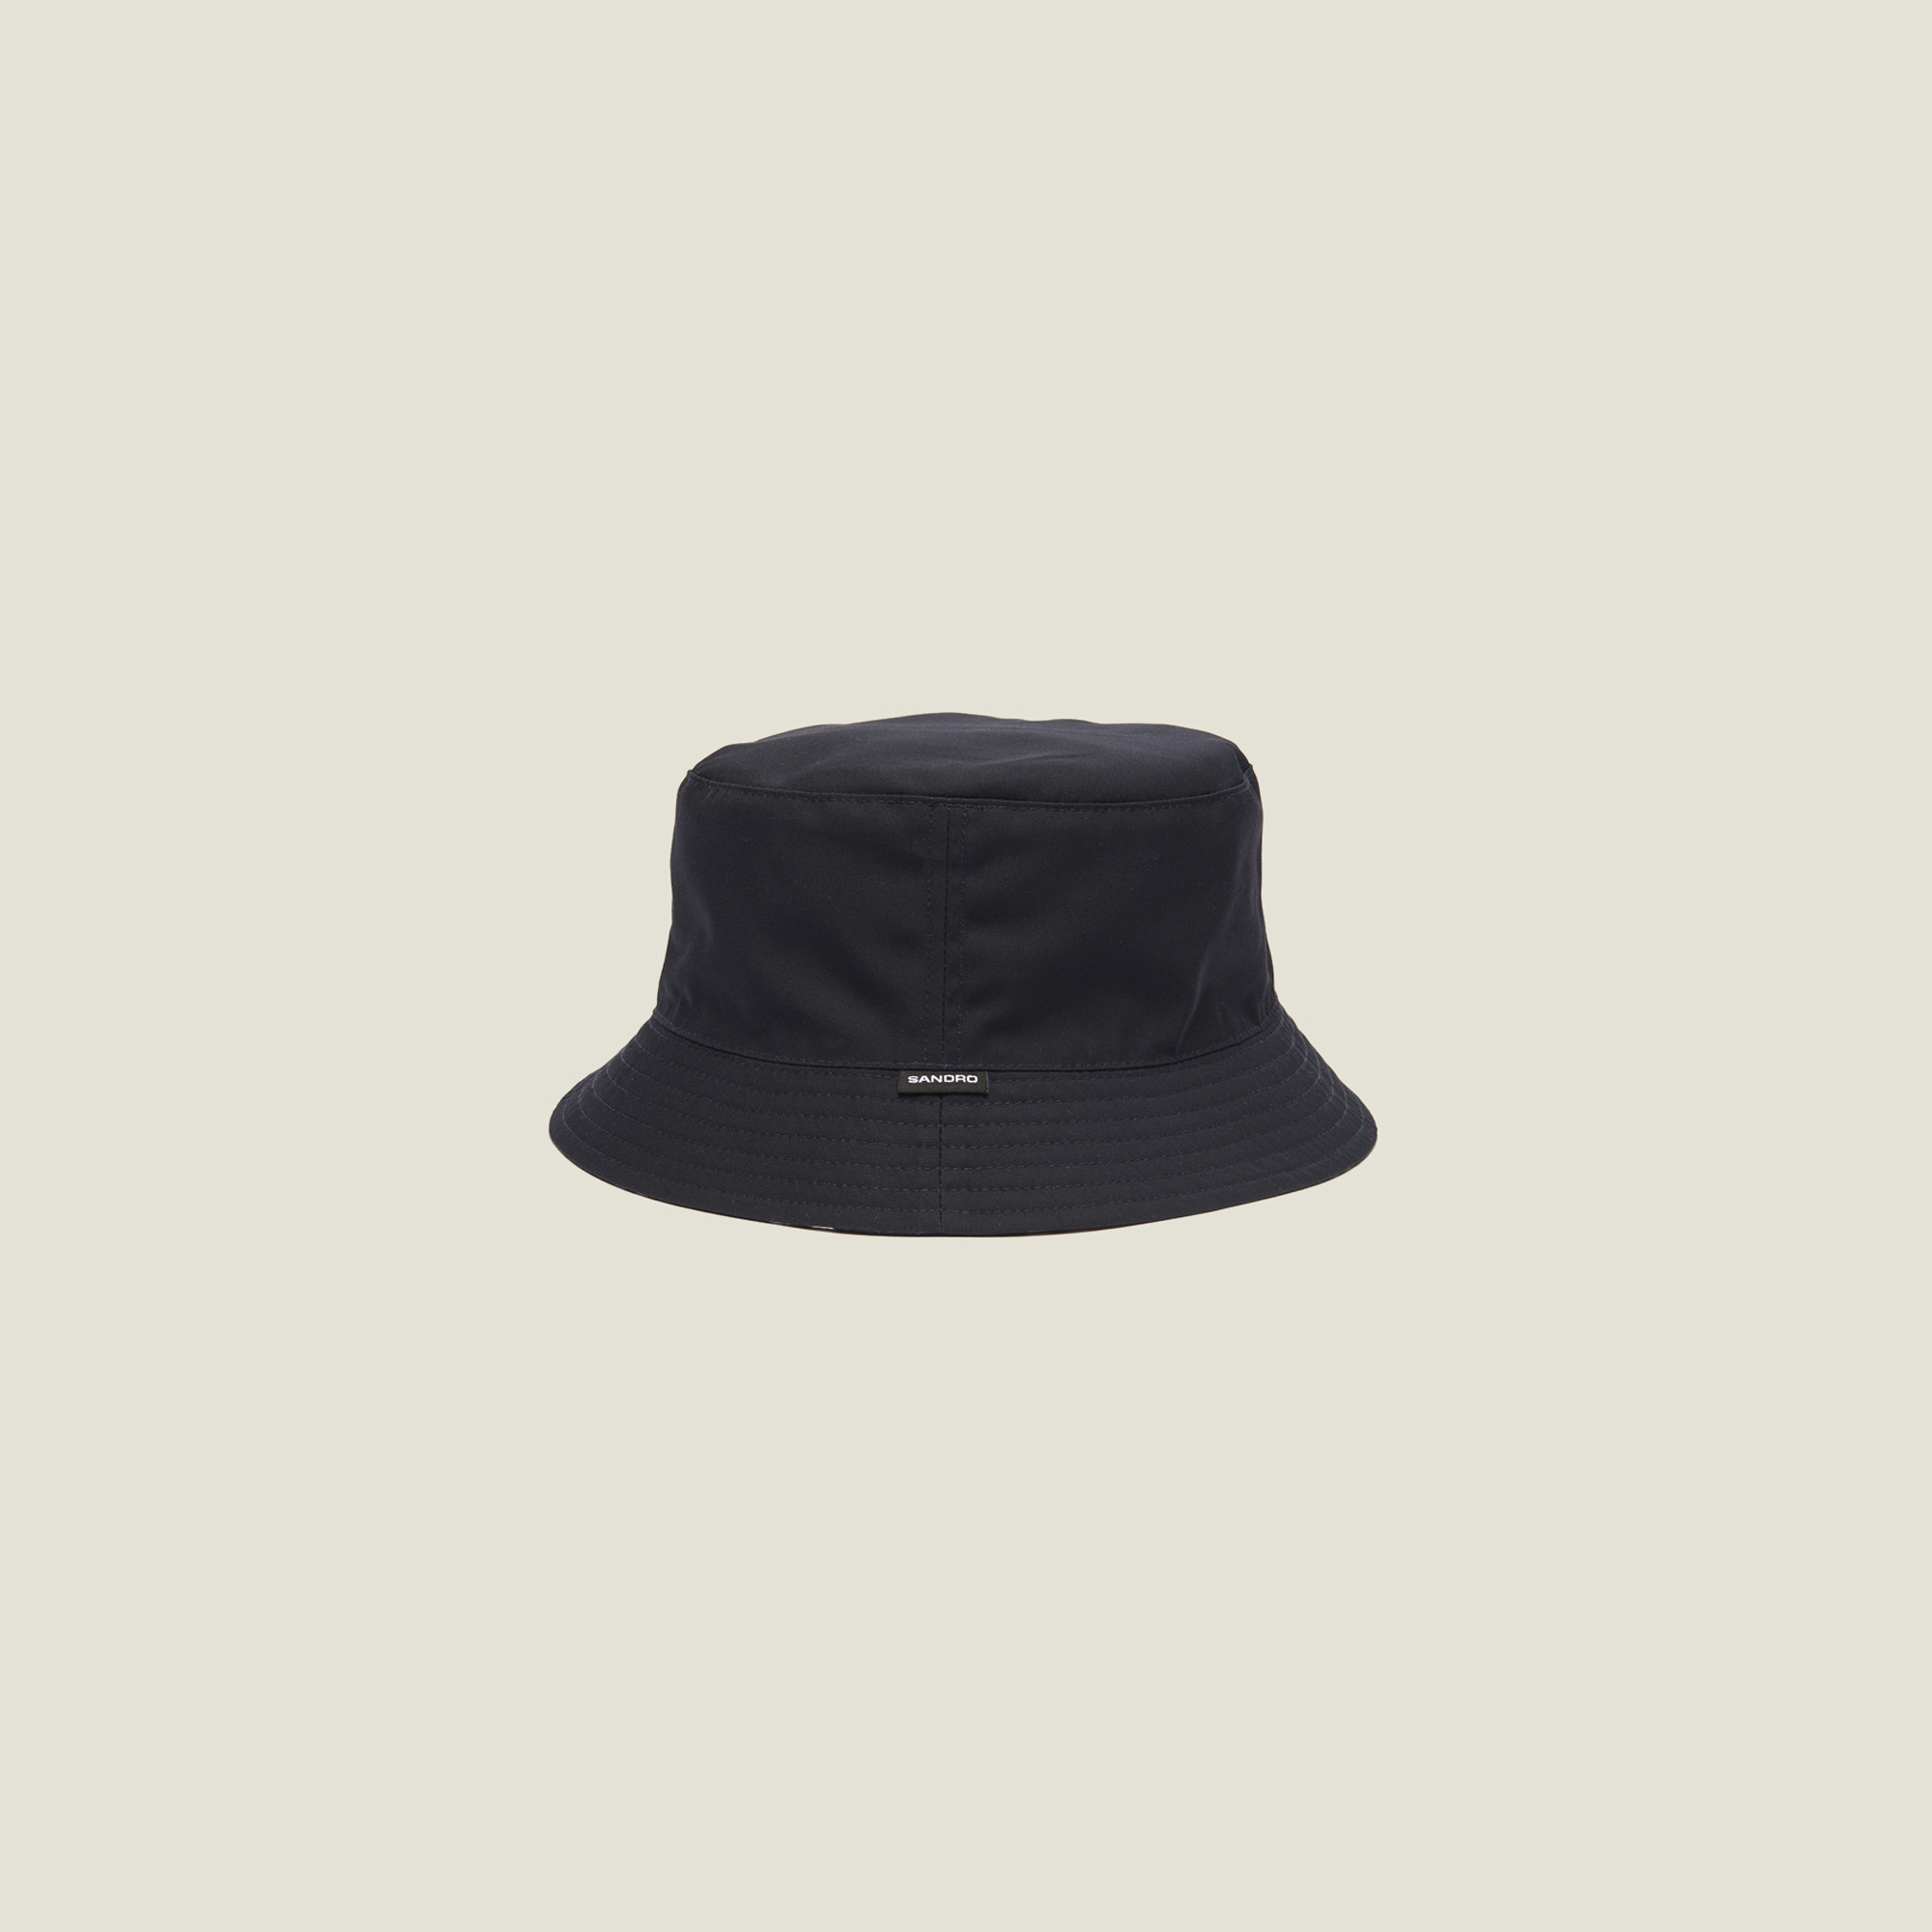 637a3651cf2 ... Reversible bucket hat   Hats color Navy Blue